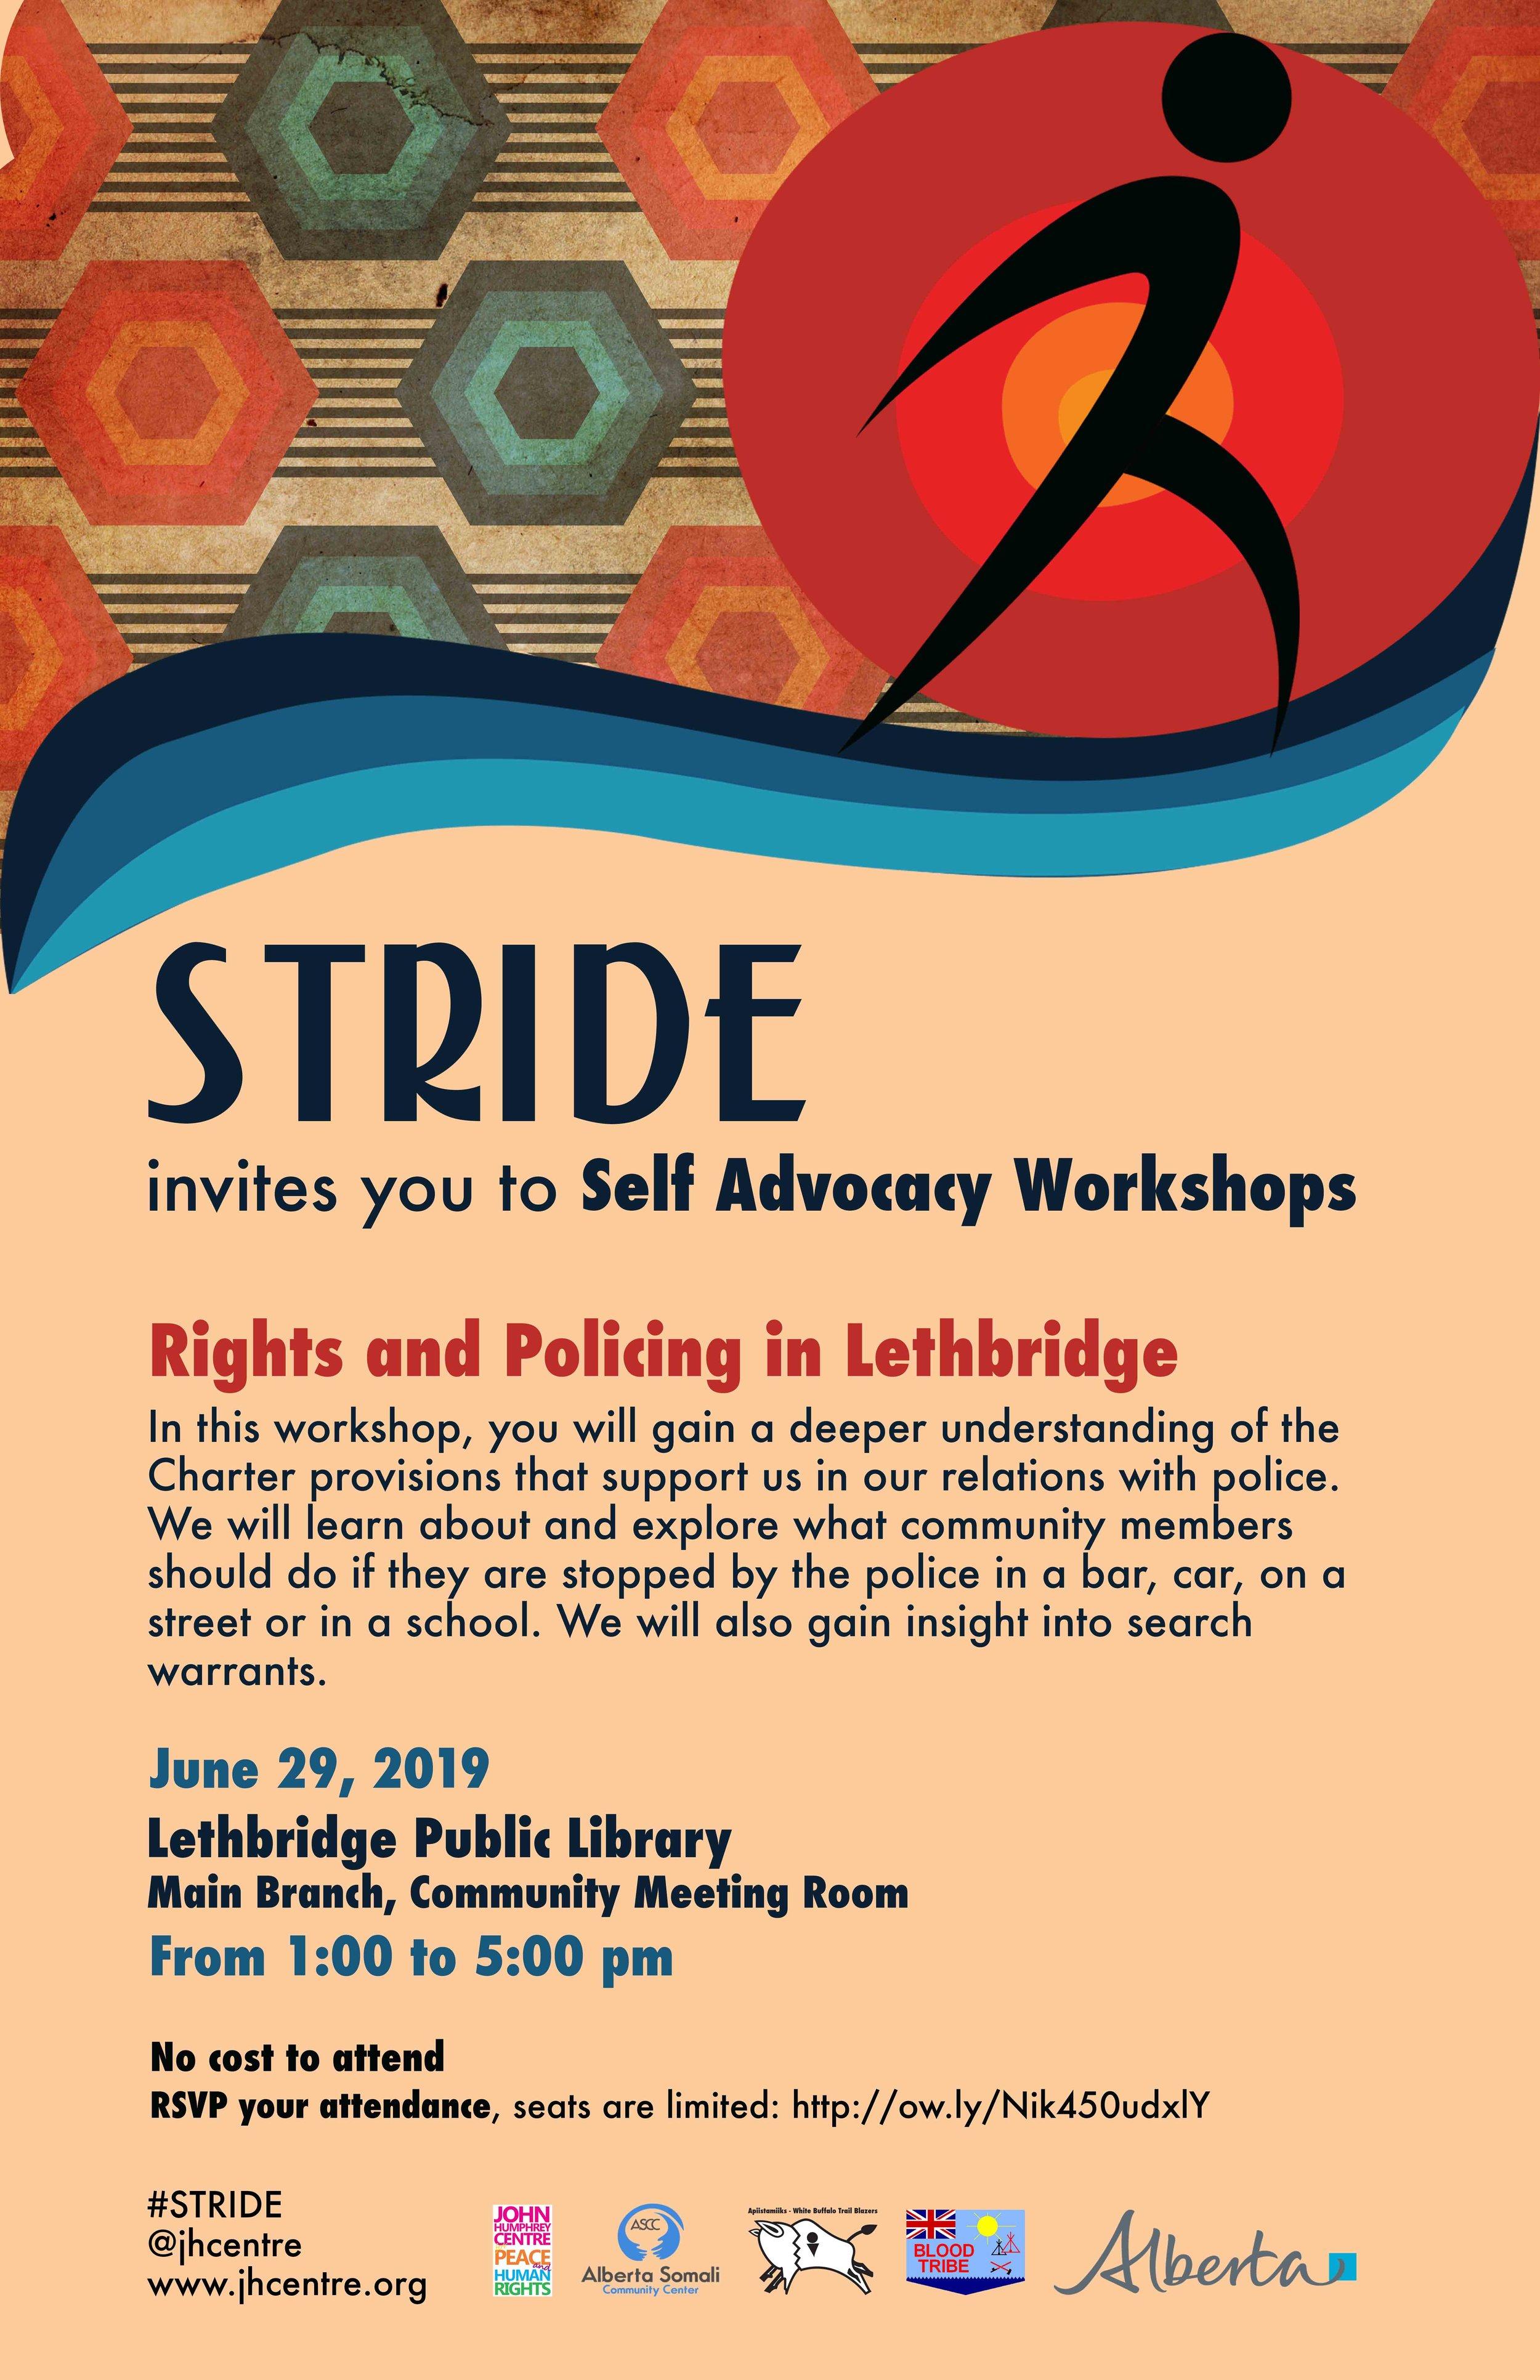 Policing Rights Lethbridge Stride2019.jpg